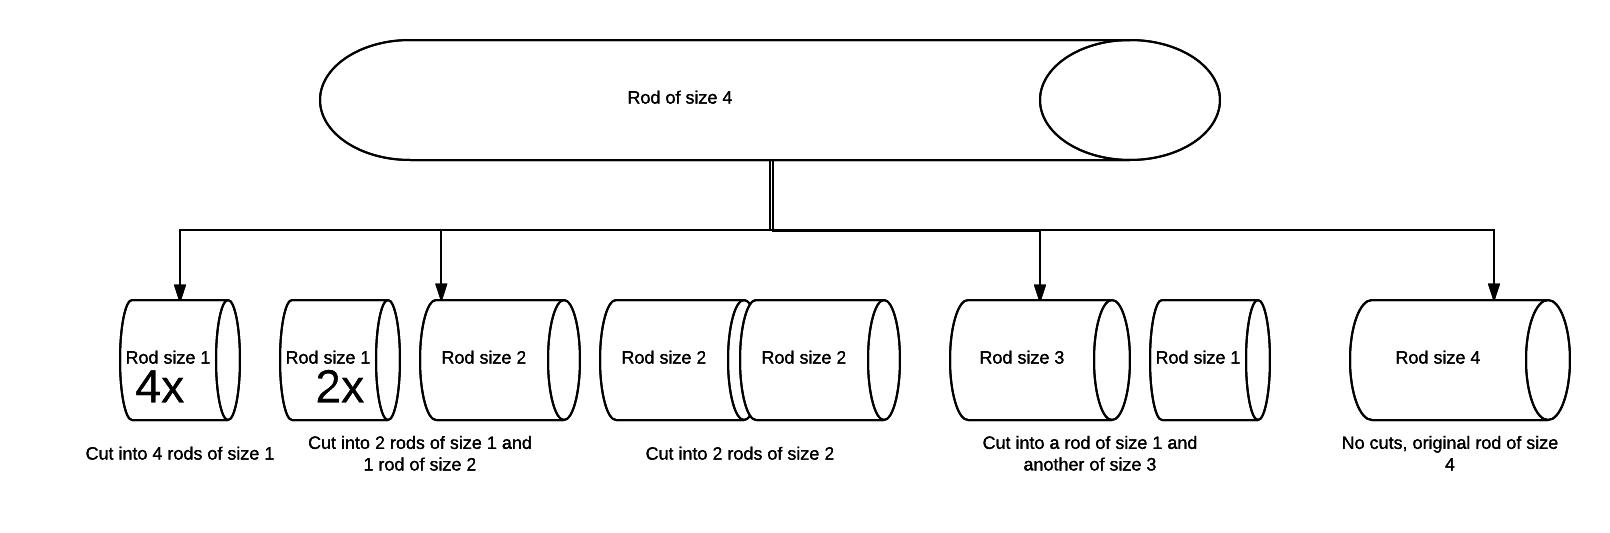 Cutting Rod Problem to get maximum profit